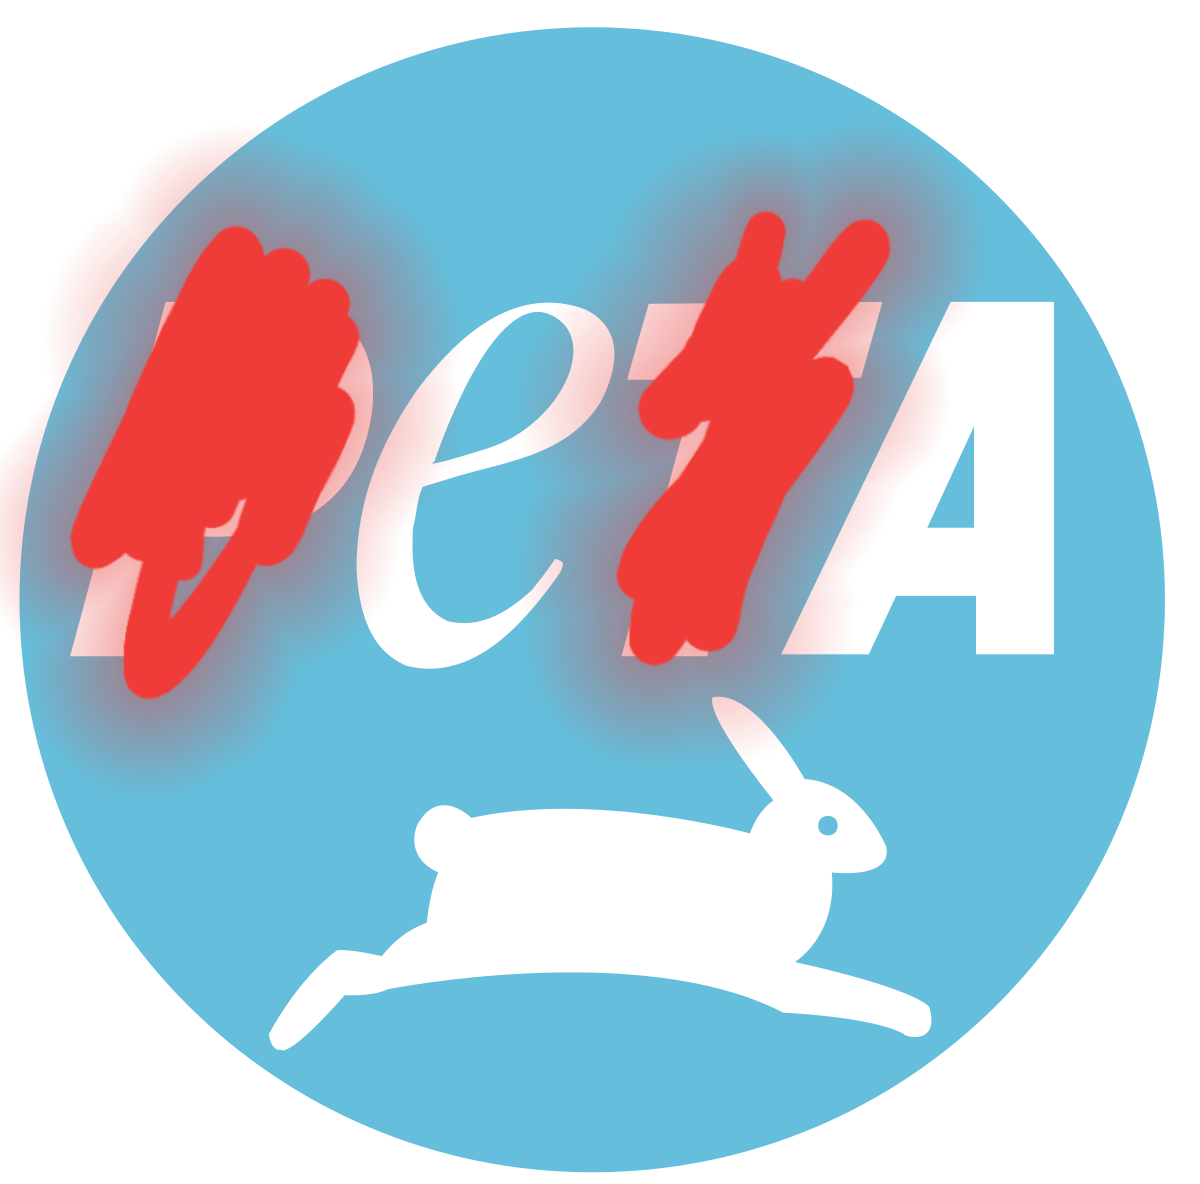 Secret message in the peta logo : Gamingcirclejerk.